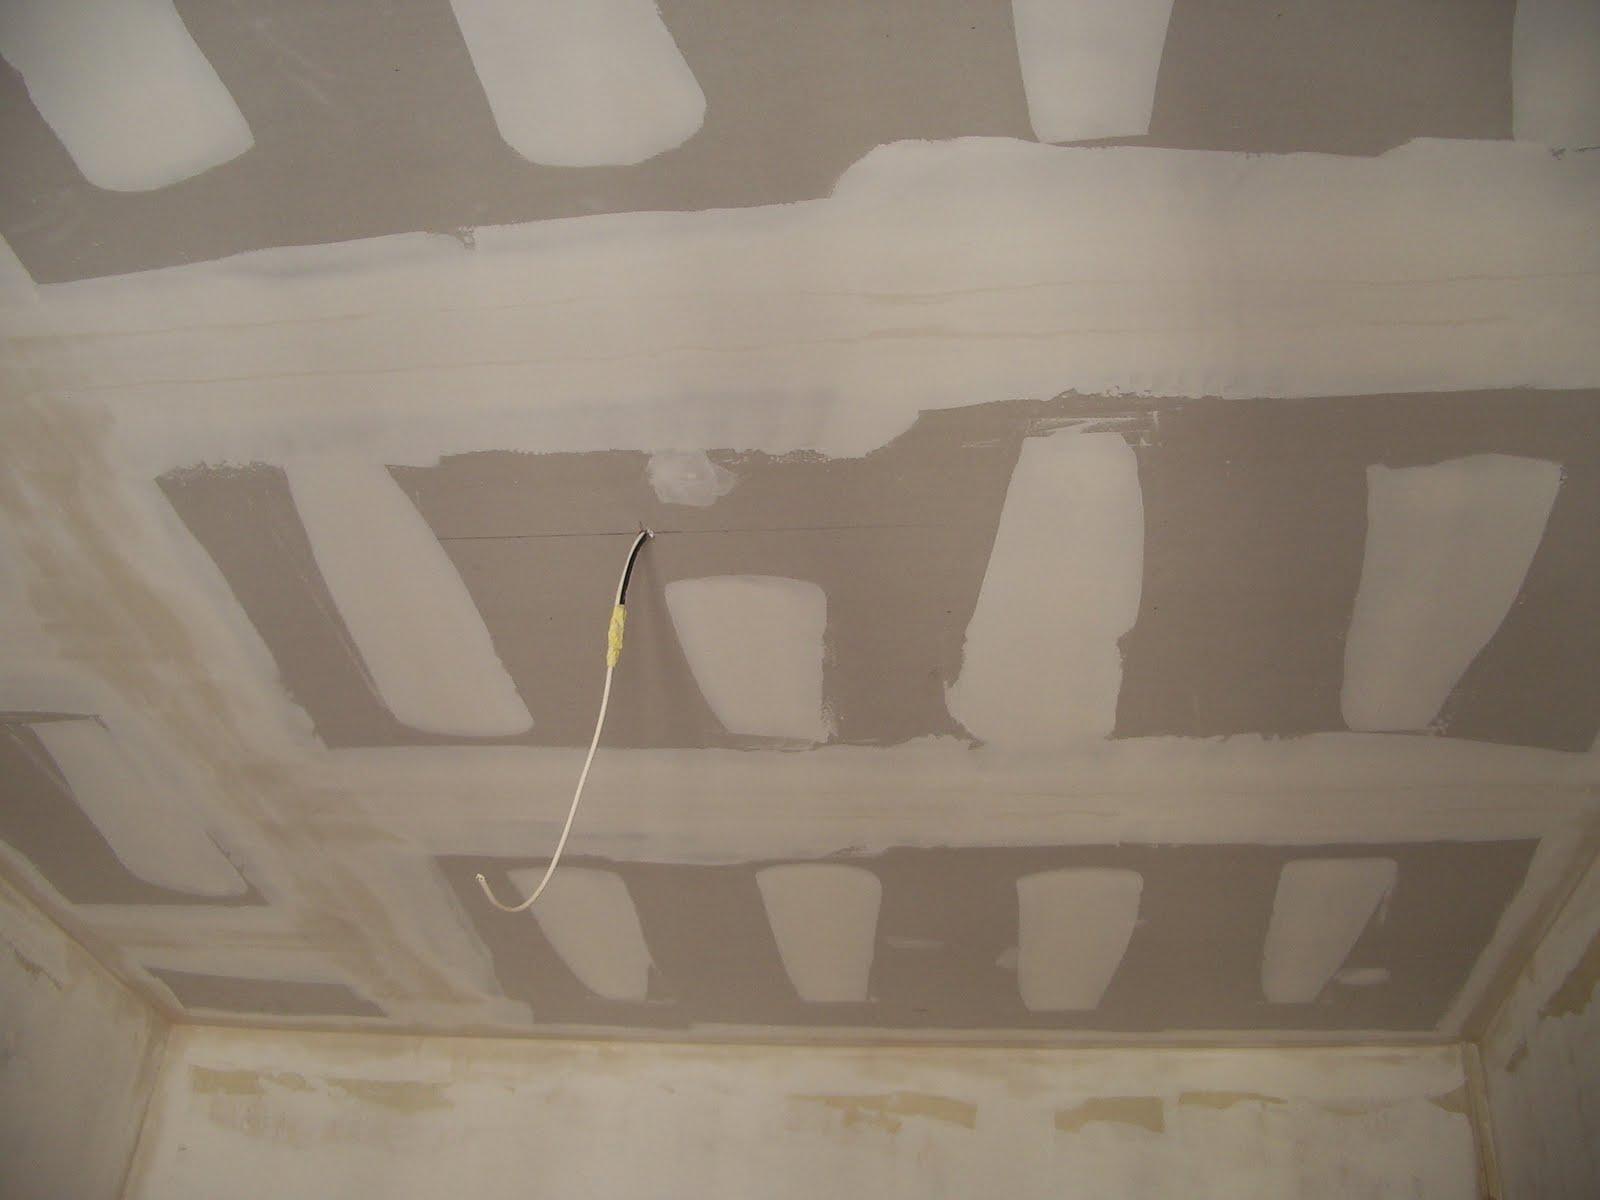 dos santos julien plaquiste jointeur plafonds. Black Bedroom Furniture Sets. Home Design Ideas